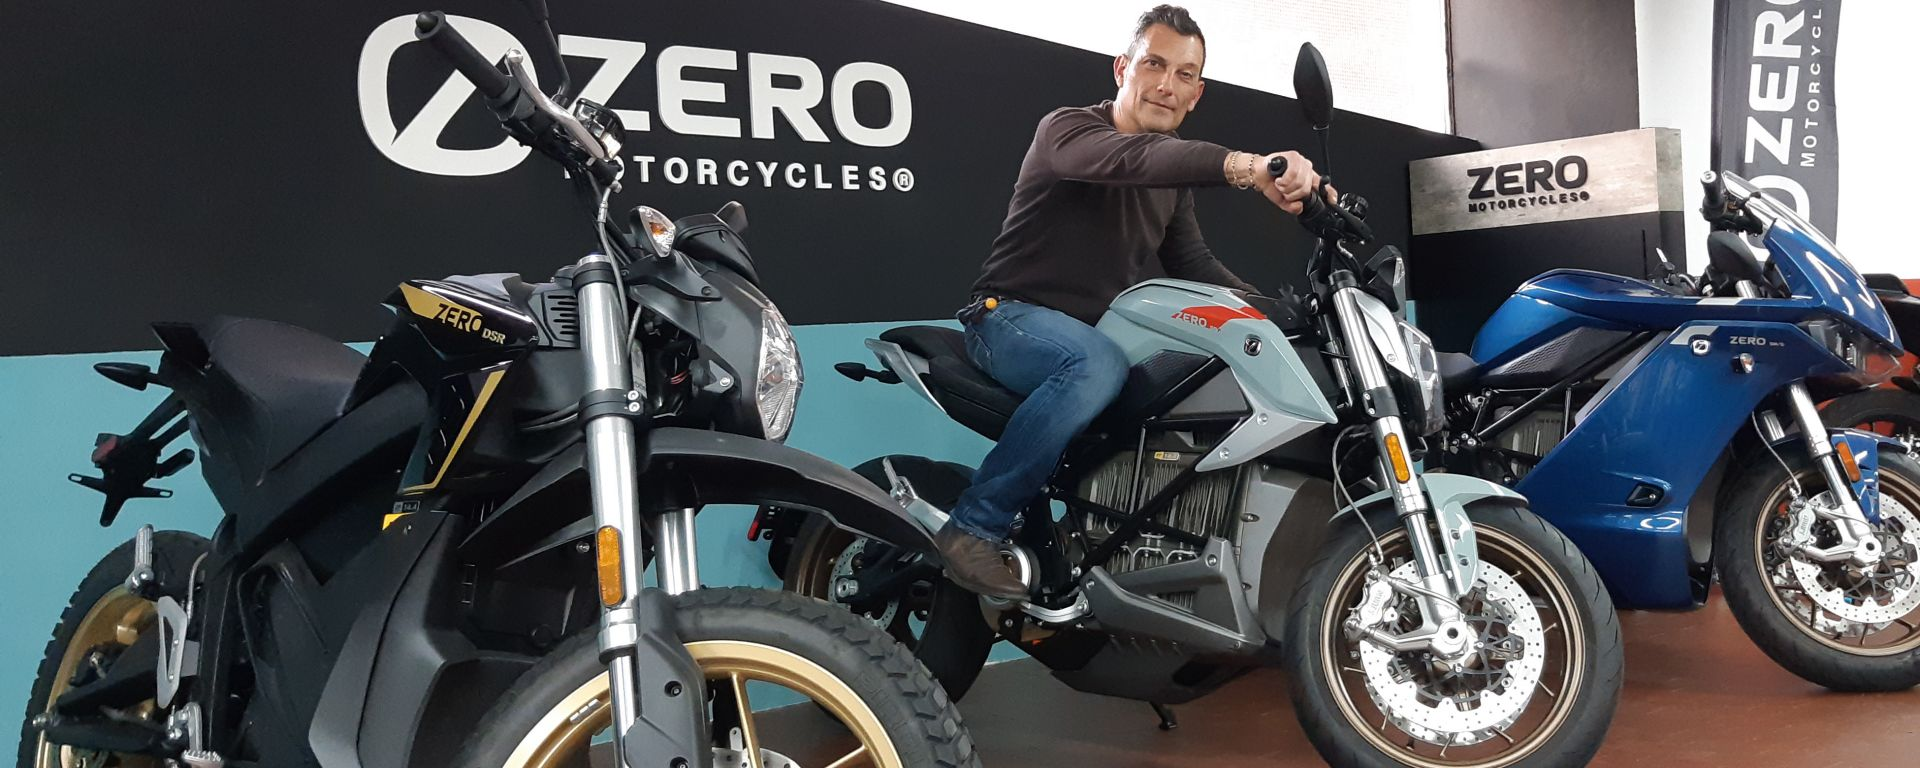 Claudio Carfora, nuovo Country Manager Italia di Zero Motorcycles